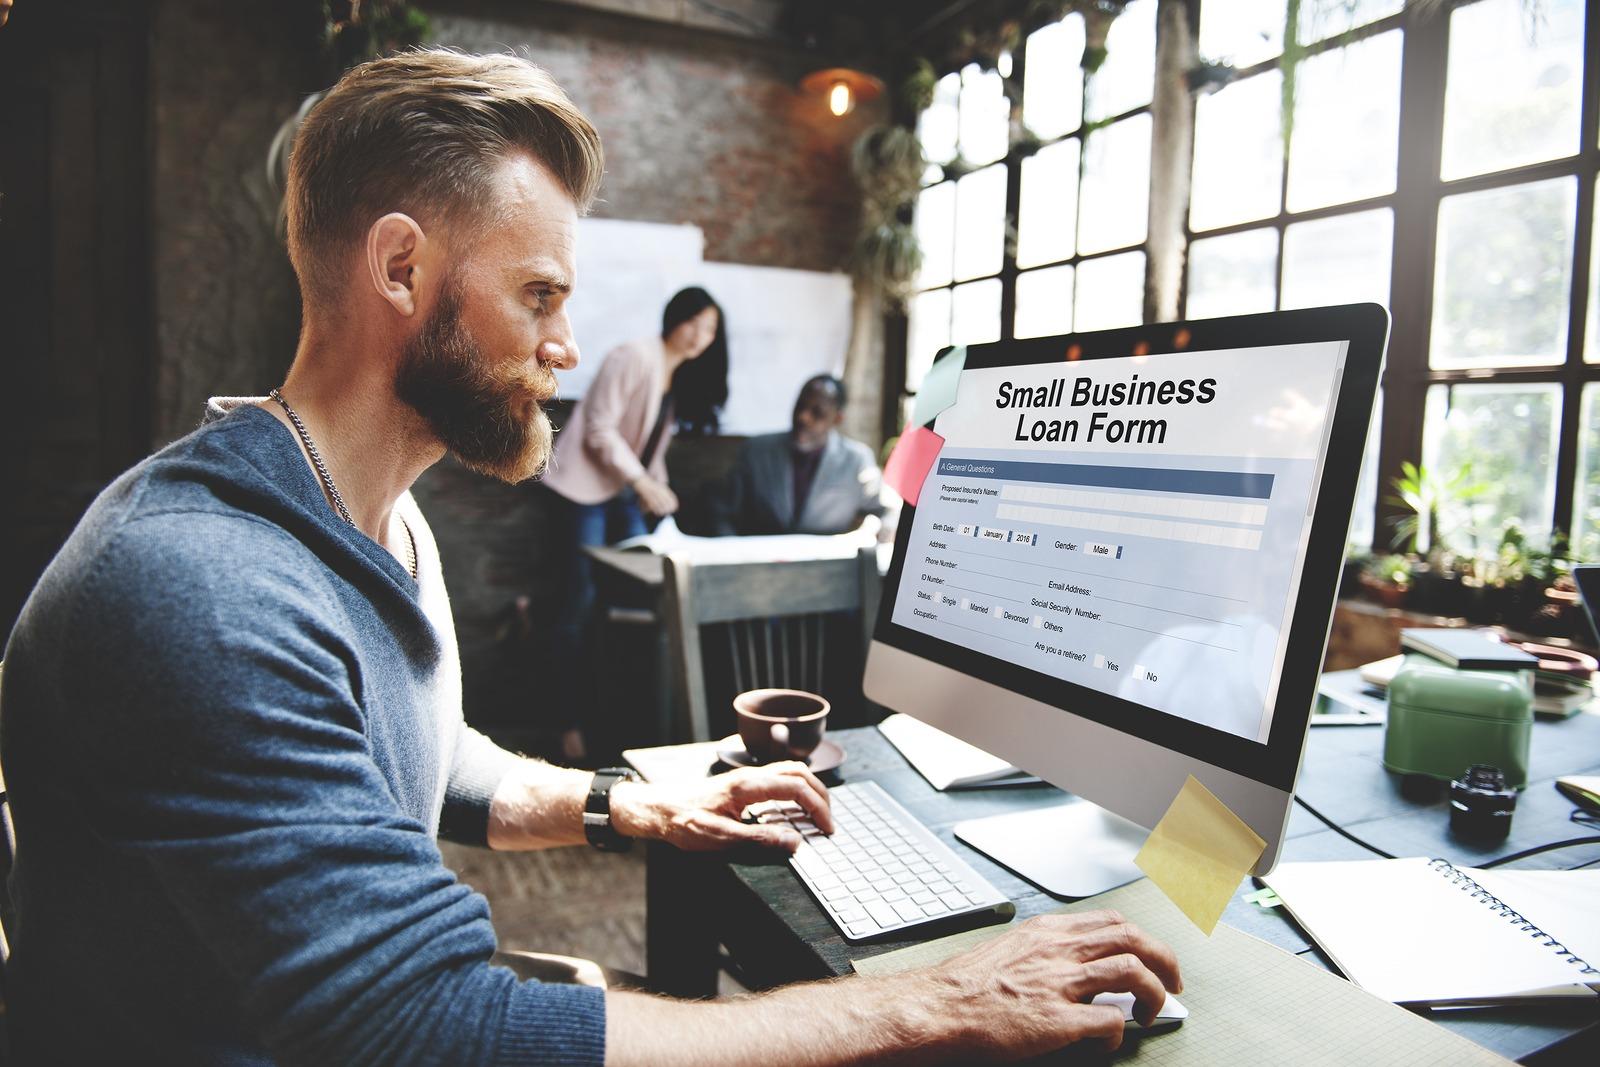 Coming Up Short on Business Credit? Consider Alternative Finance